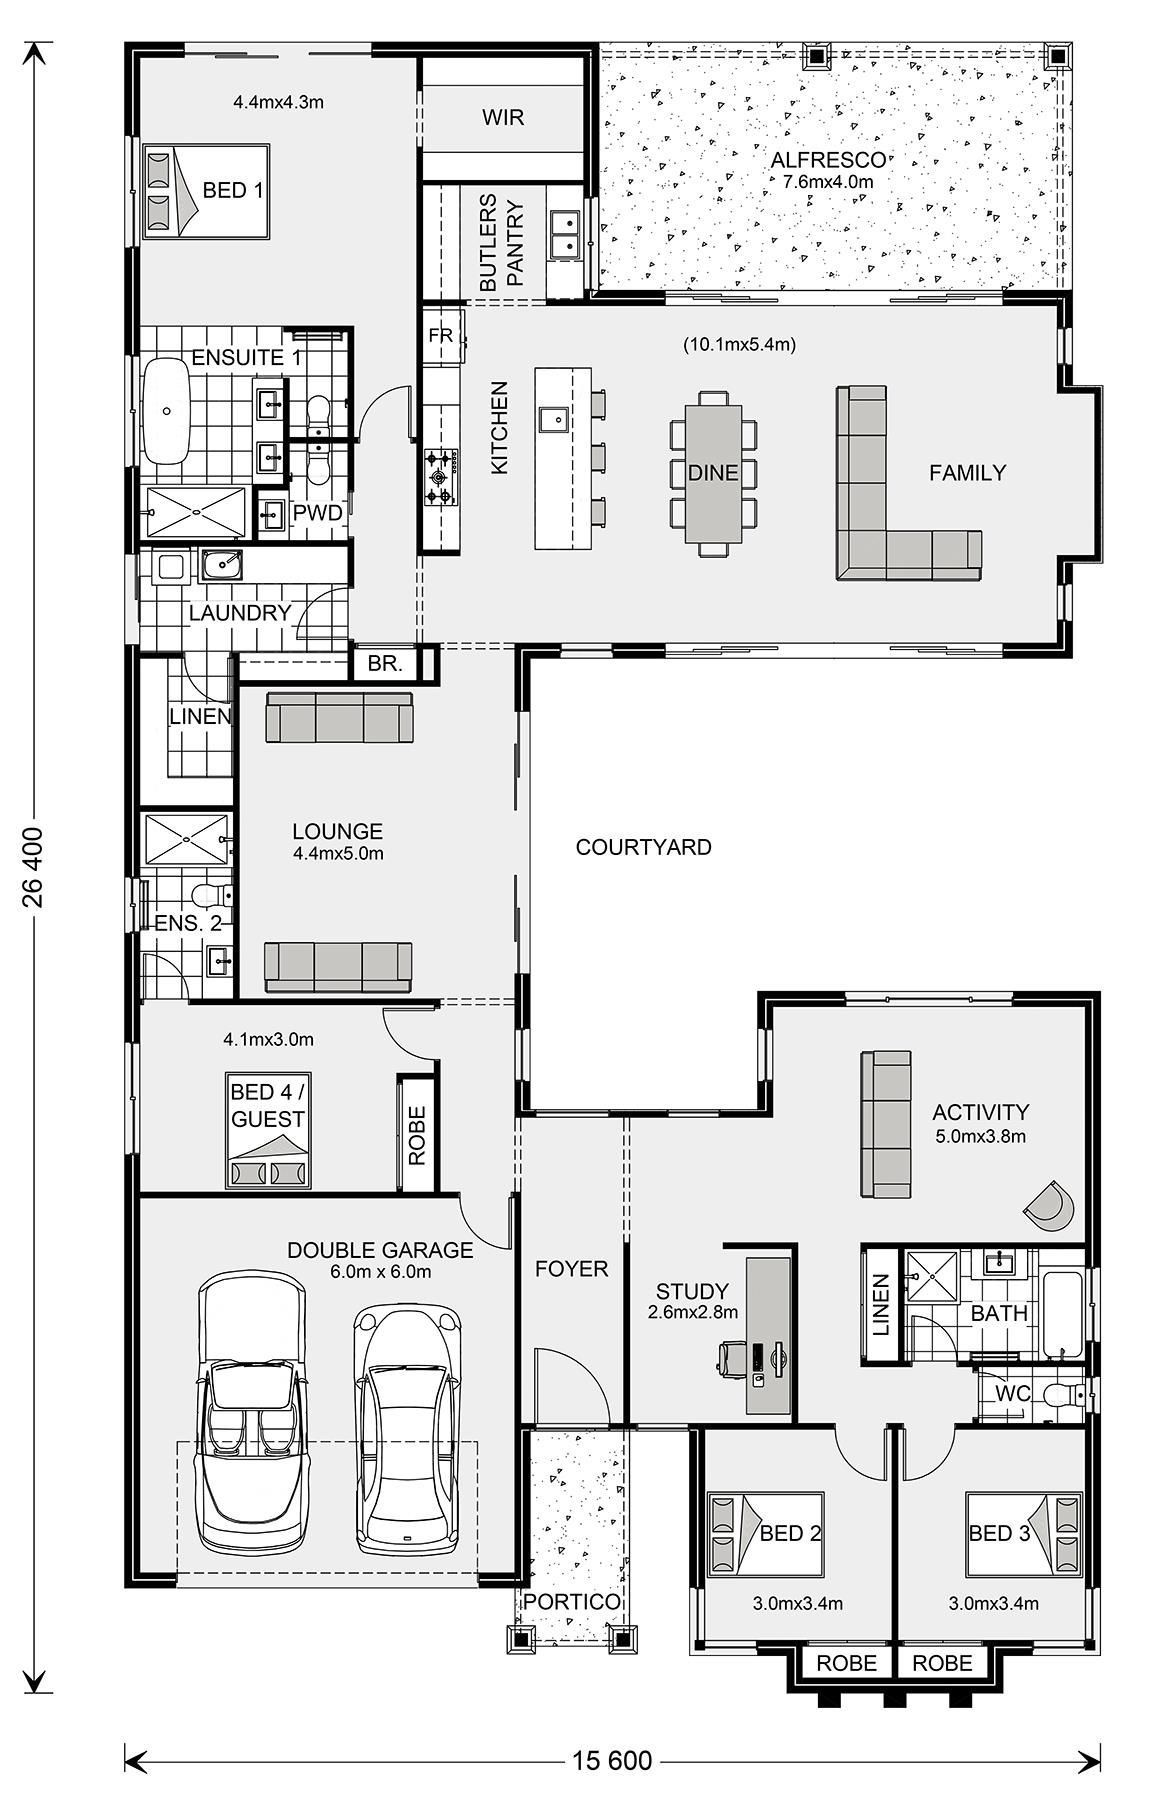 House Floor Plans Maker 2021 Bungalow Floor Plans Home Design Floor Plans Floor Plan Design